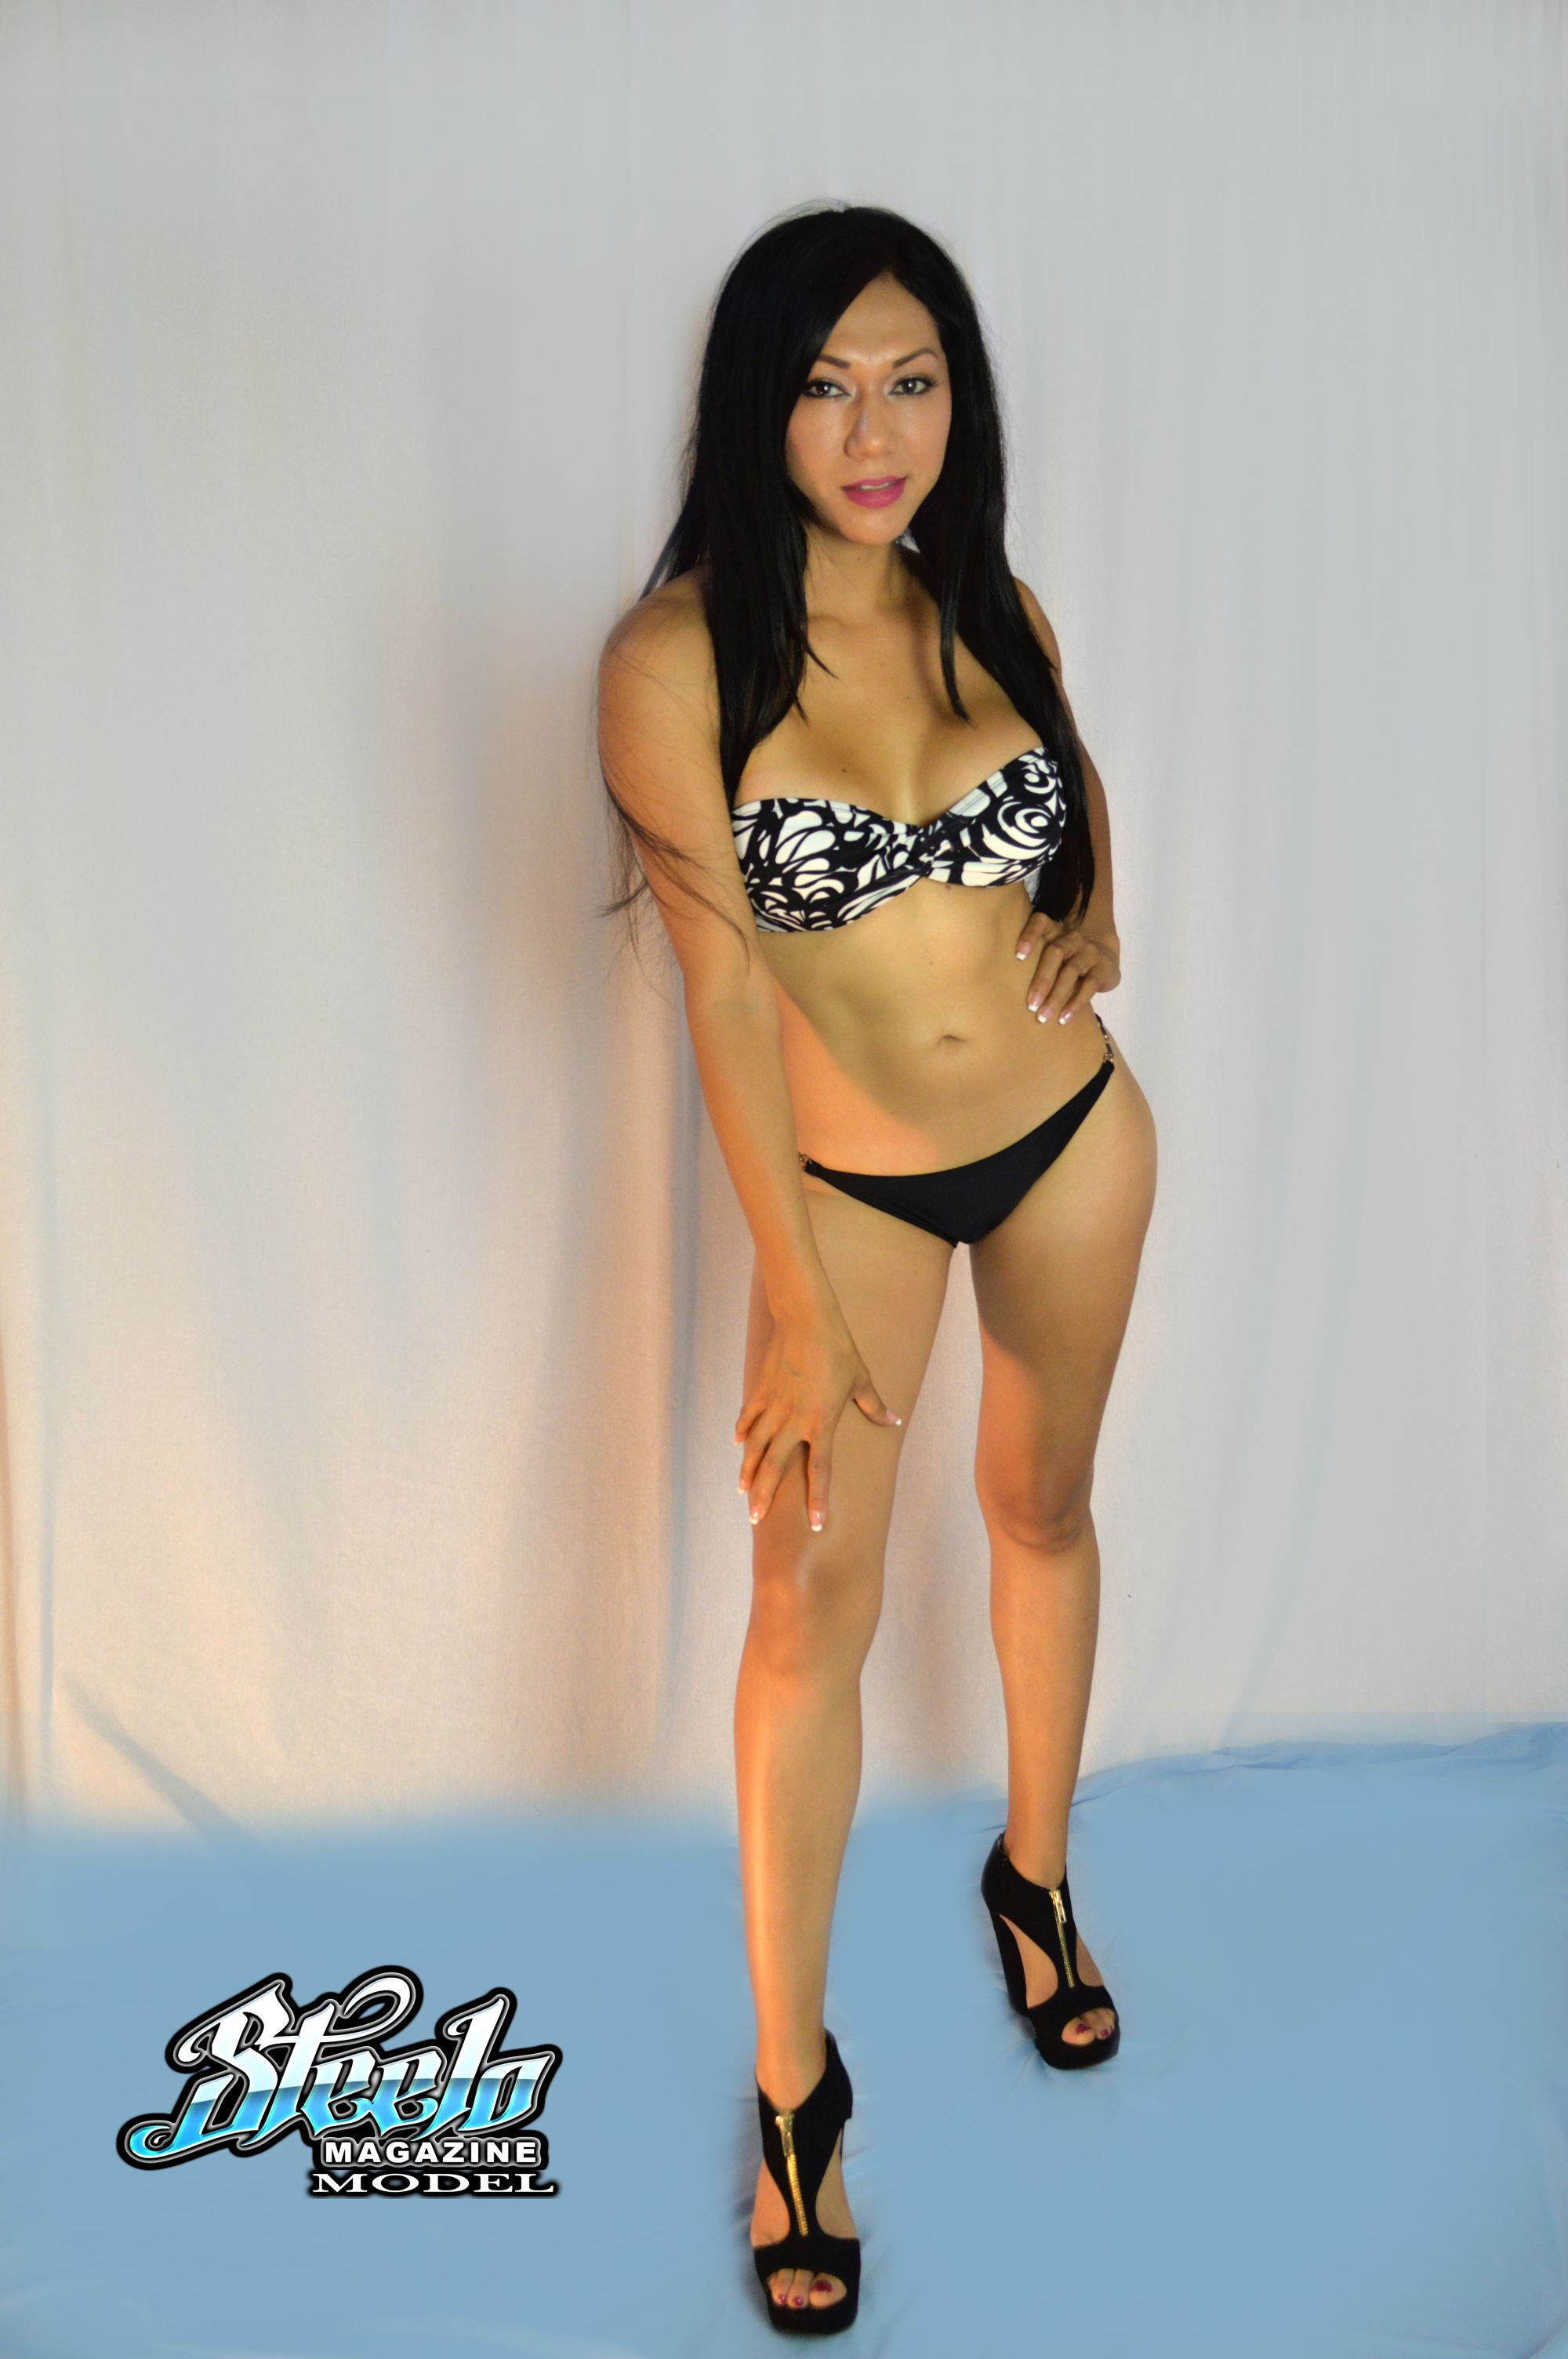 jackie-h-bikini-shoot-82